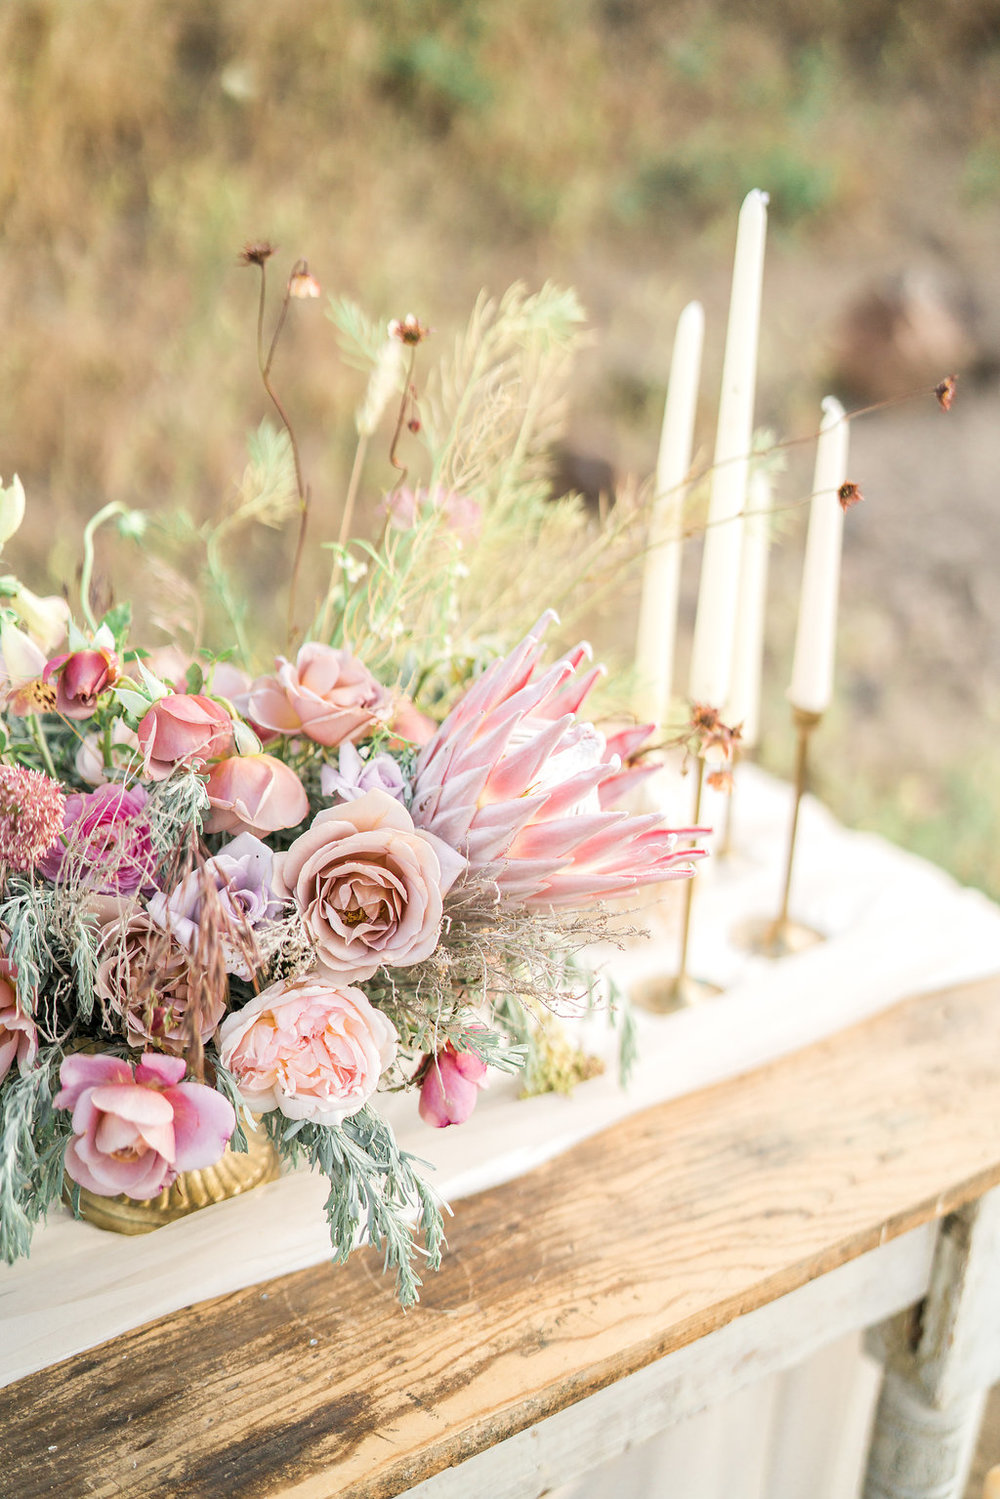 seattle-wedding-flower-design-sauvage-fleur-design-april-yentas-boho-modern-photo